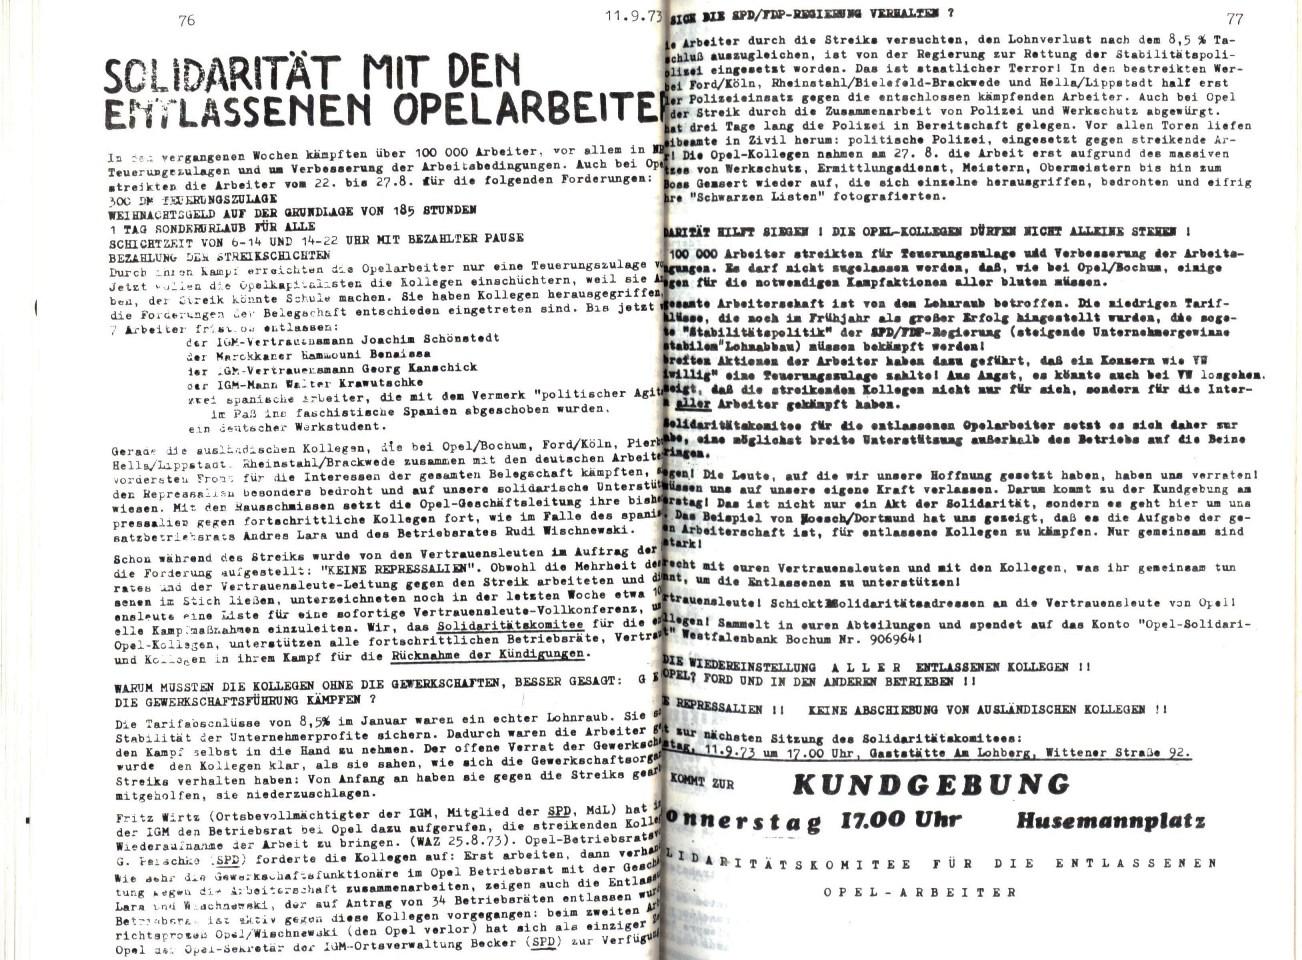 Bochum_IGM_Opel_PG_Opel_streikt_1973_040